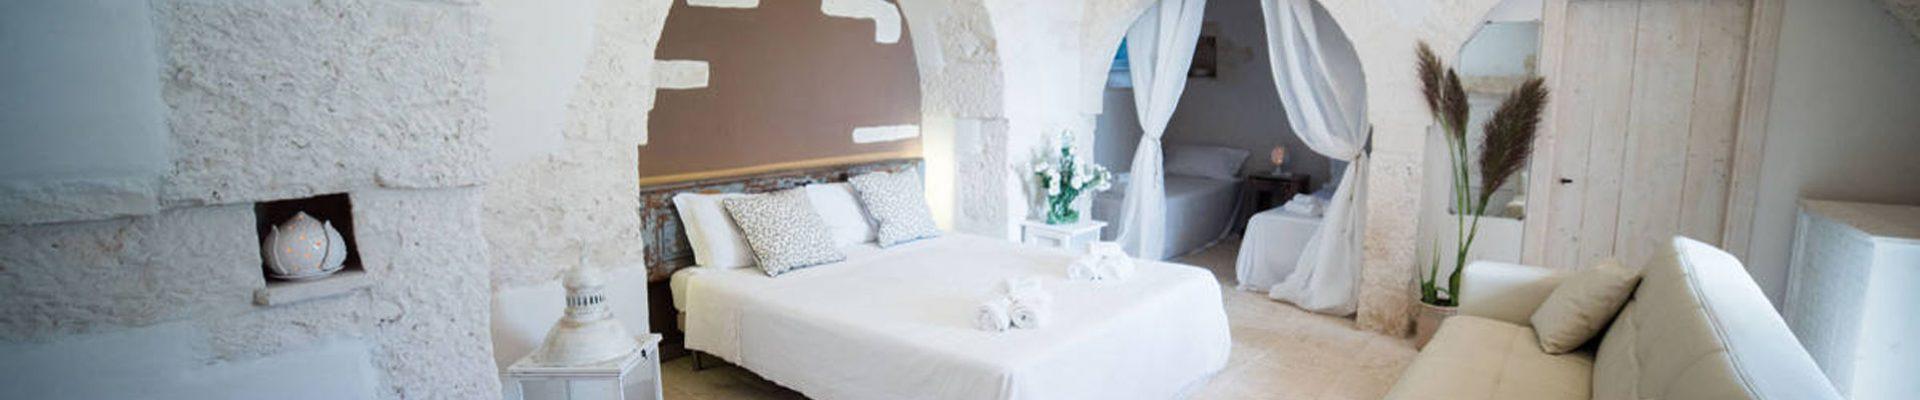 Dimora-Millepietre-camera matrimoniale